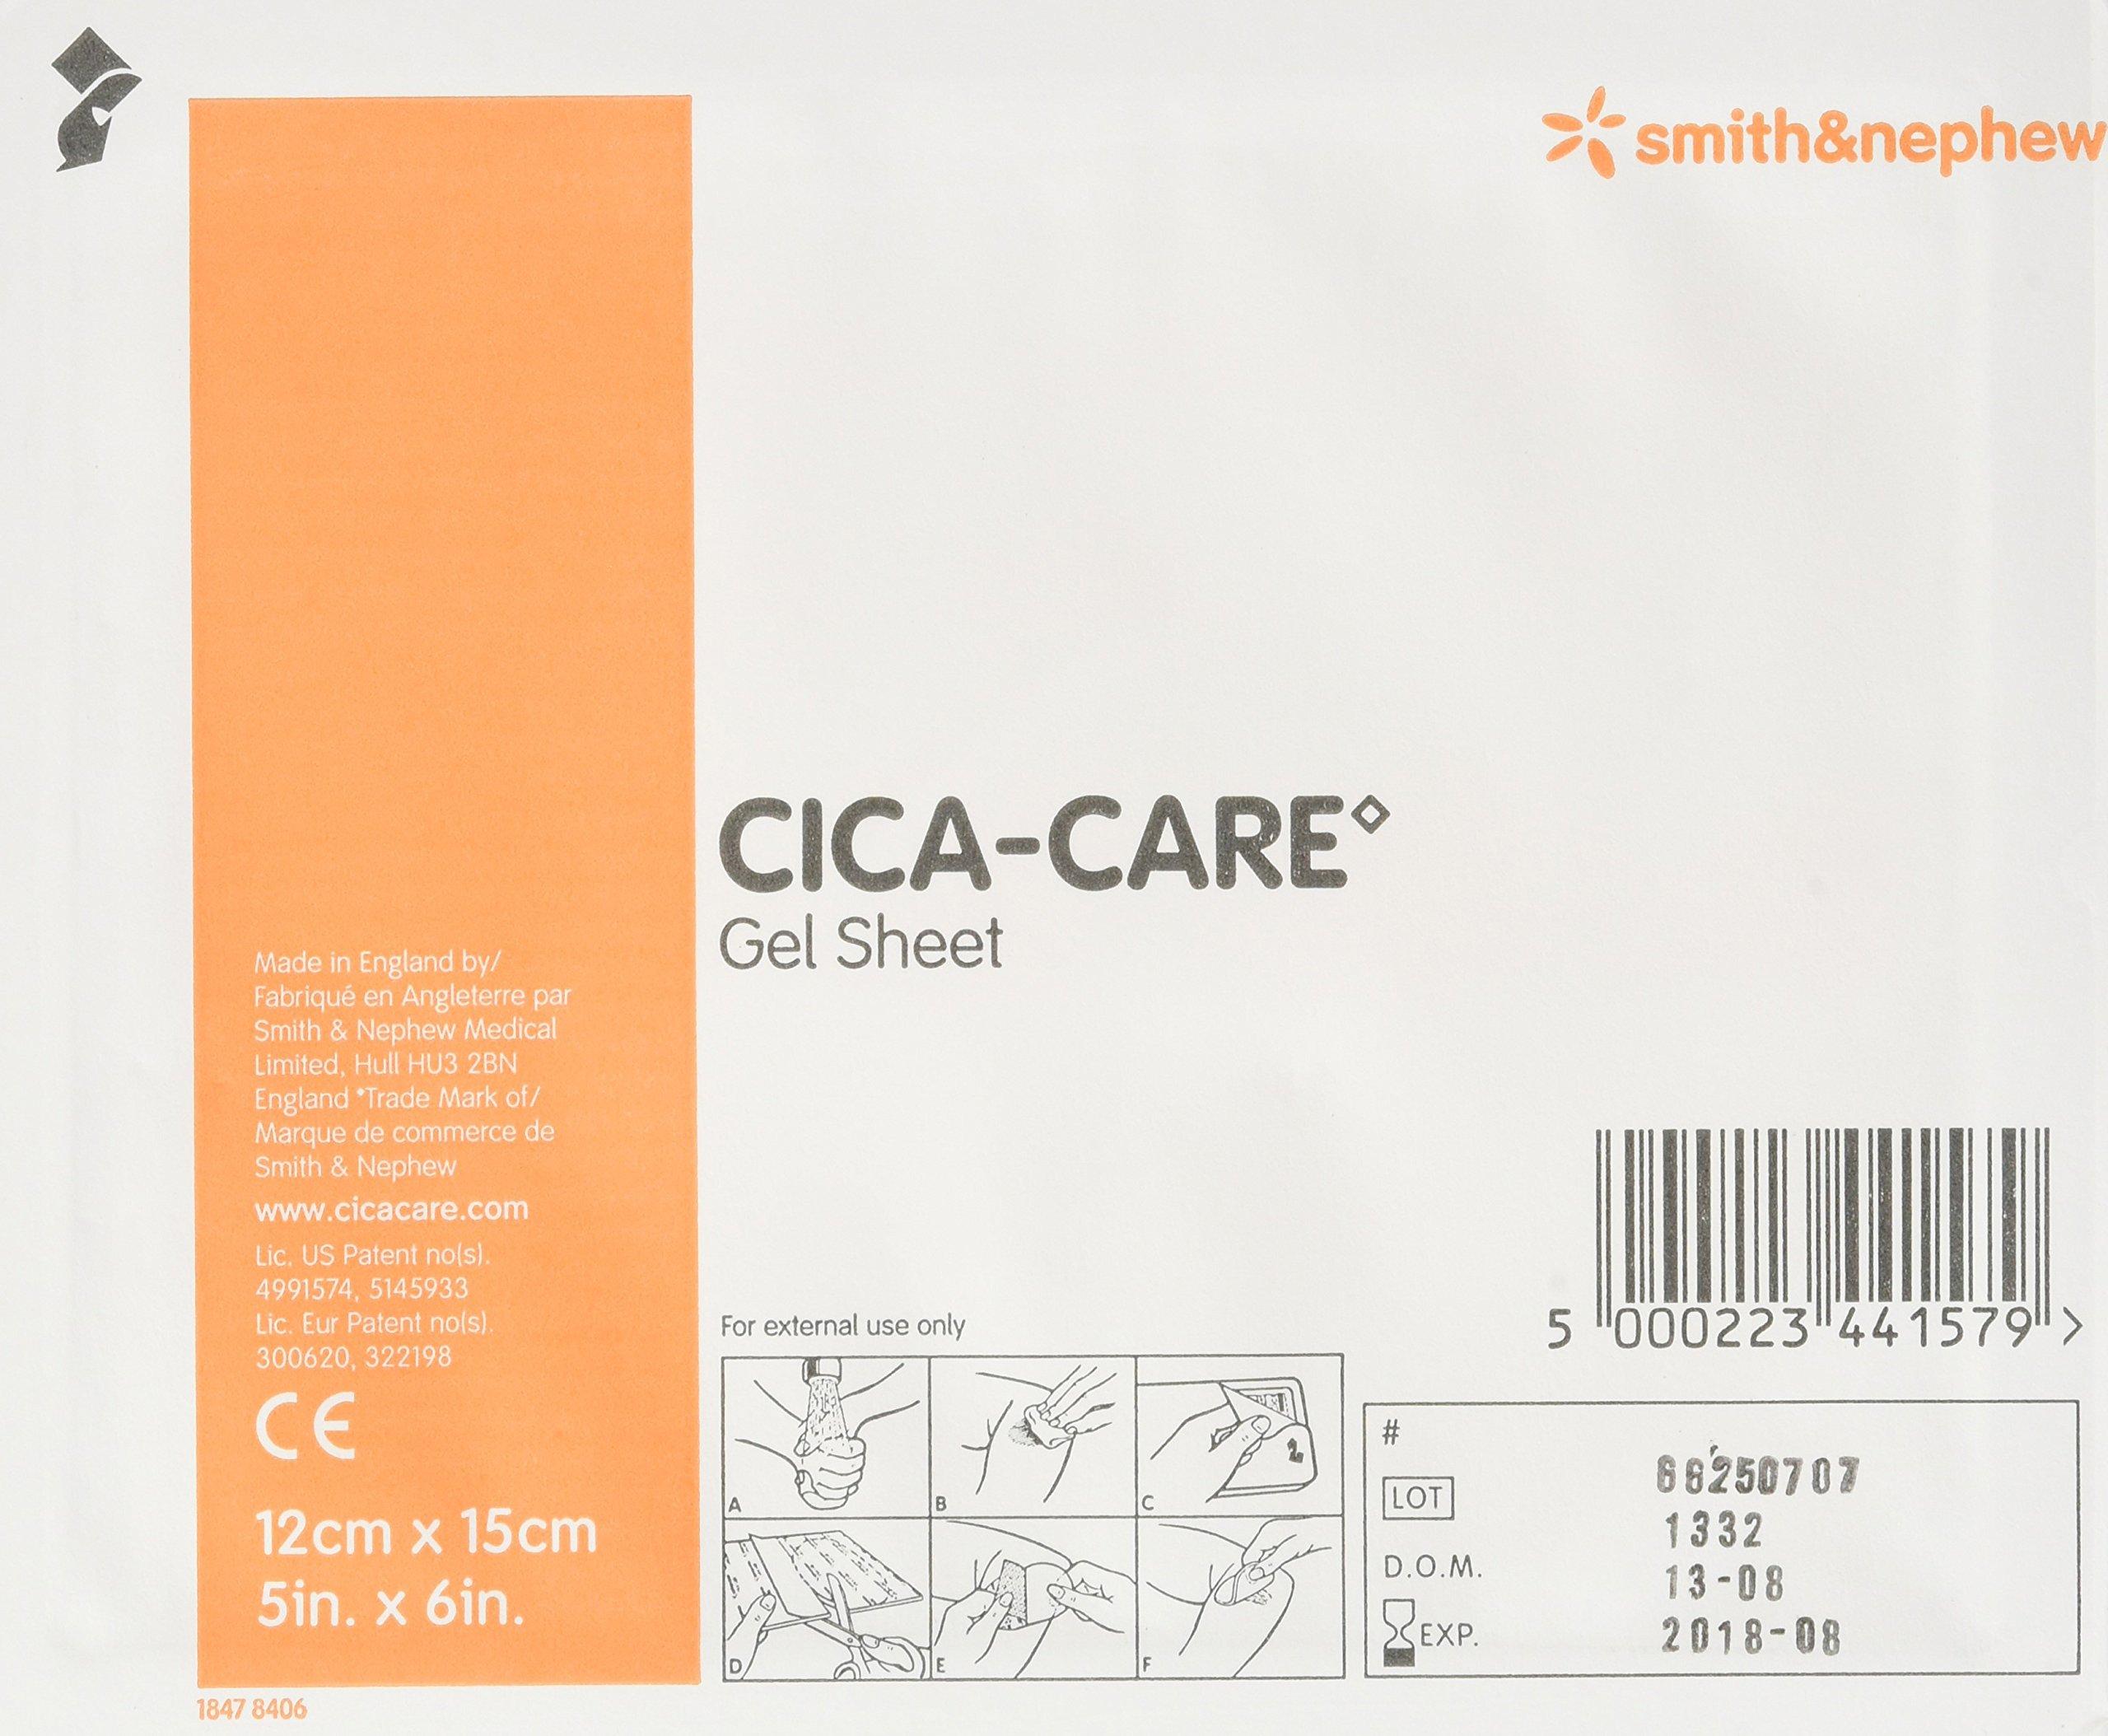 CICA-Care Silicone Gel Sheeting 12cm X 15cm by SMITH & NEPHEW INC.